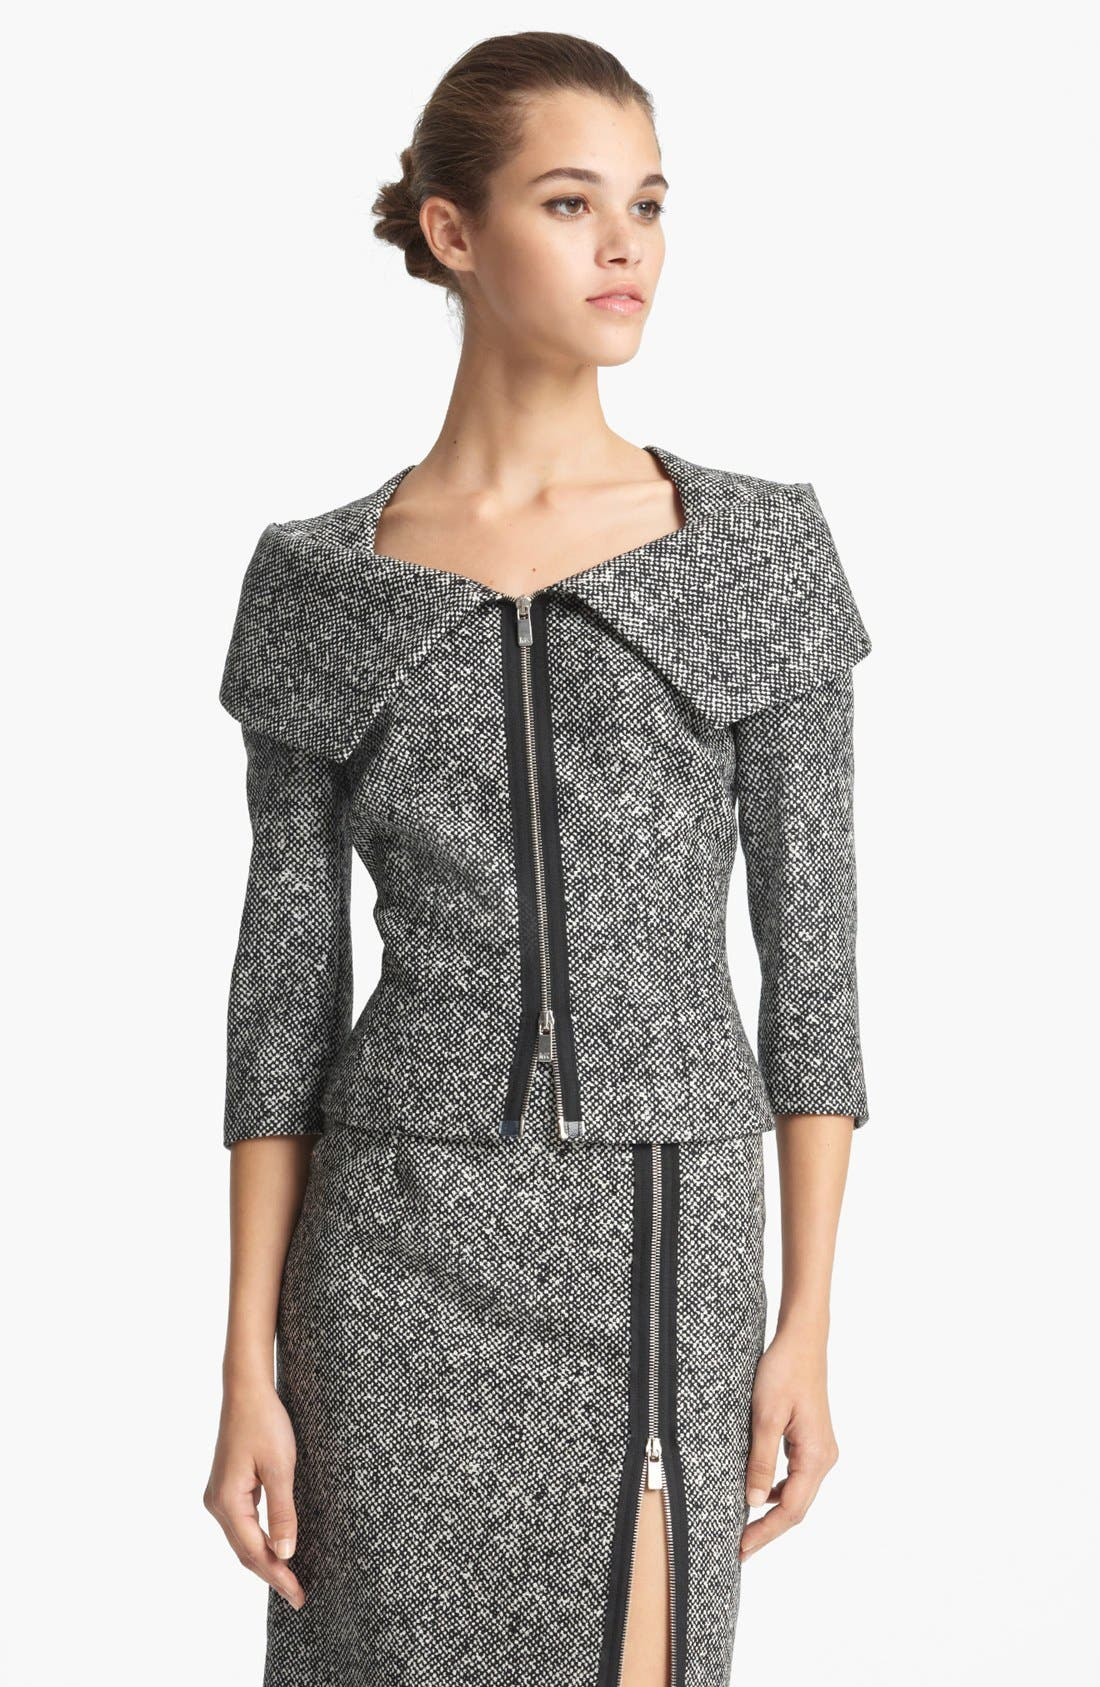 Main Image - Michael Kors Origami Collar Tweed Jacket